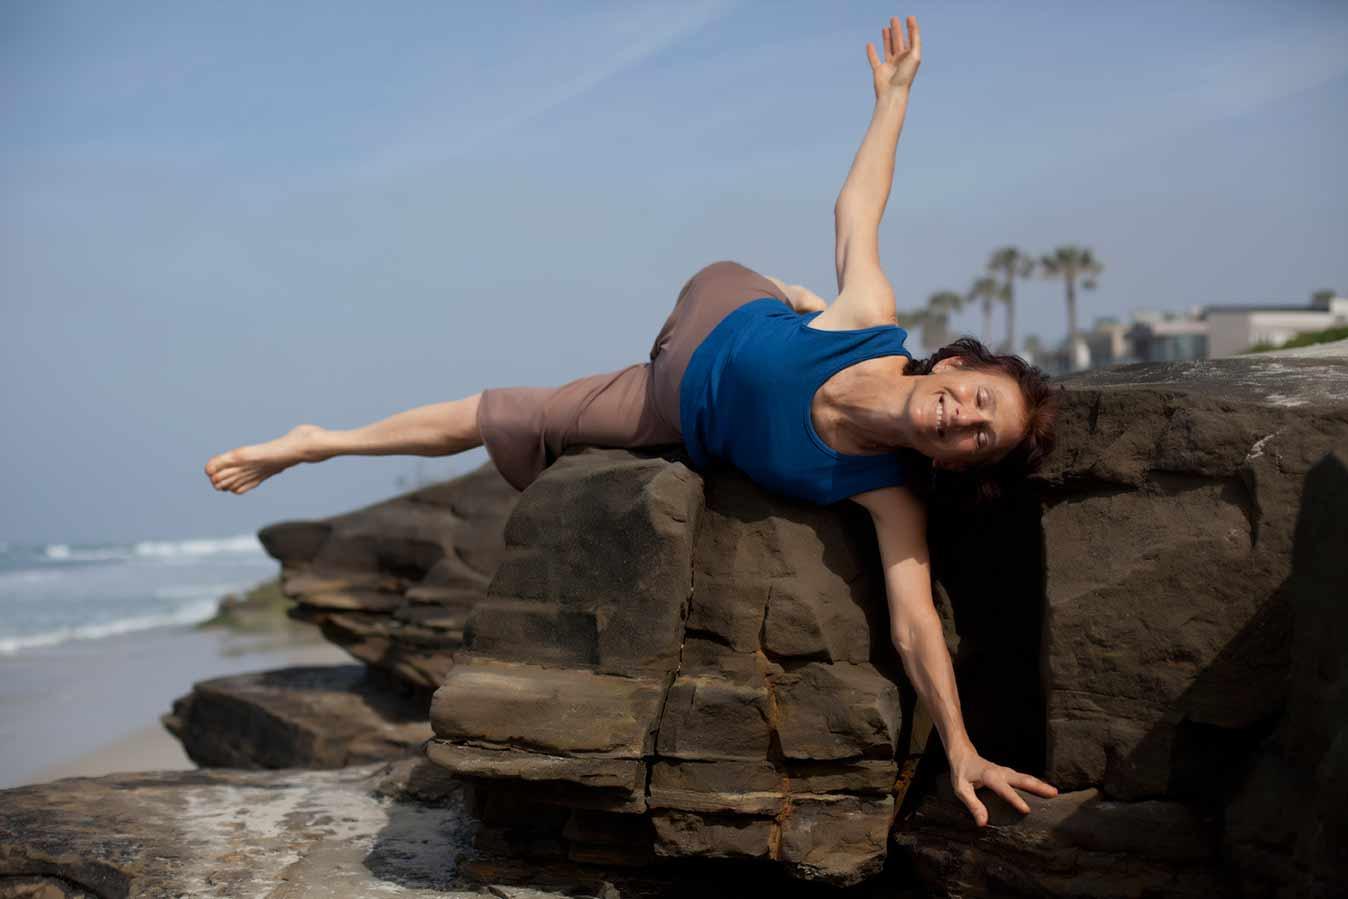 Woman doing yoga on rocks, Zyoga San Diego